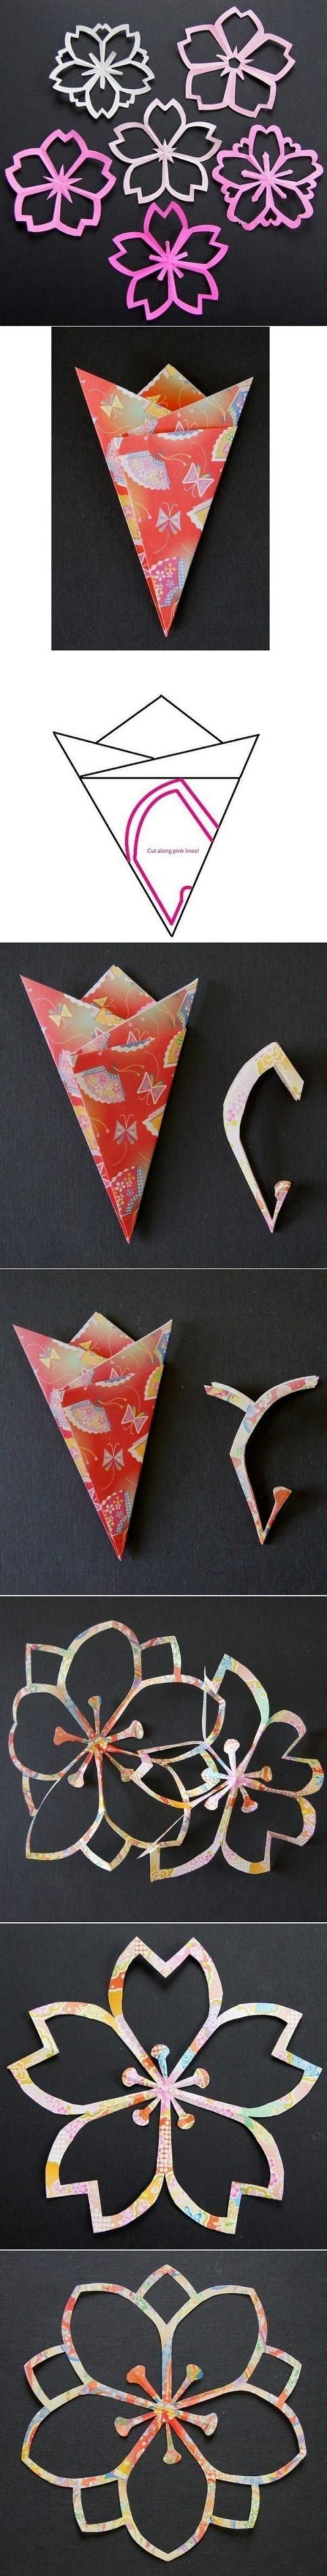 {DIY Paper Flower Cutting}